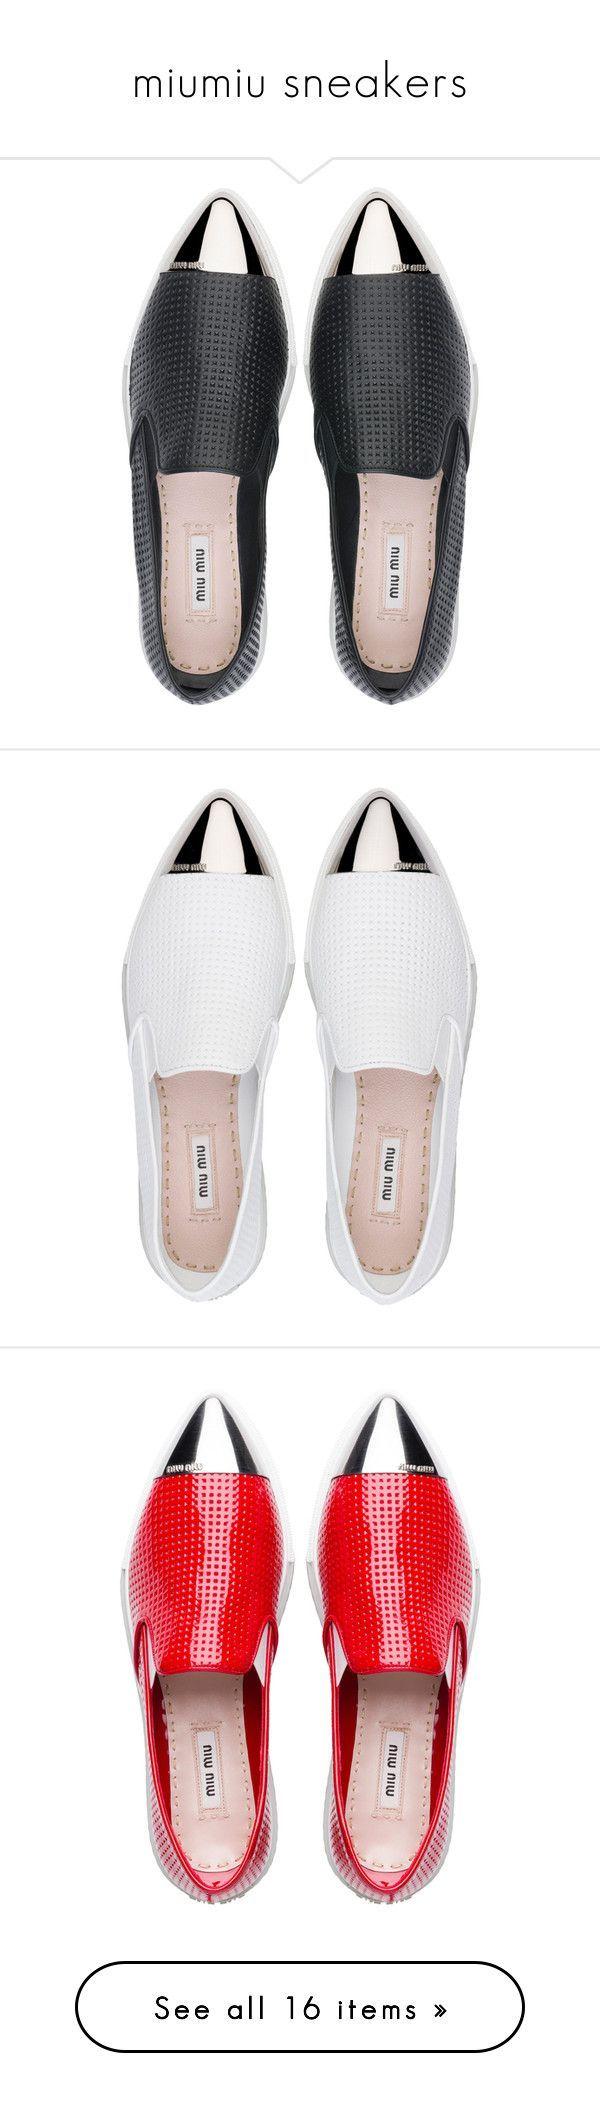 """miumiu sneakers"" by luxuriouslyclassy ❤ liked on Polyvore featuring shoes, sneakers, flats, sapatos, miu miu, miu miu sneakers, miu miu flats, flat pumps, flat shoes and metallic slip on sneakers Dieses Produkt und weitere MIU MIU Taschen jetzt auf www.designertaschen-shops.de/brands/miu-miu entdecken"